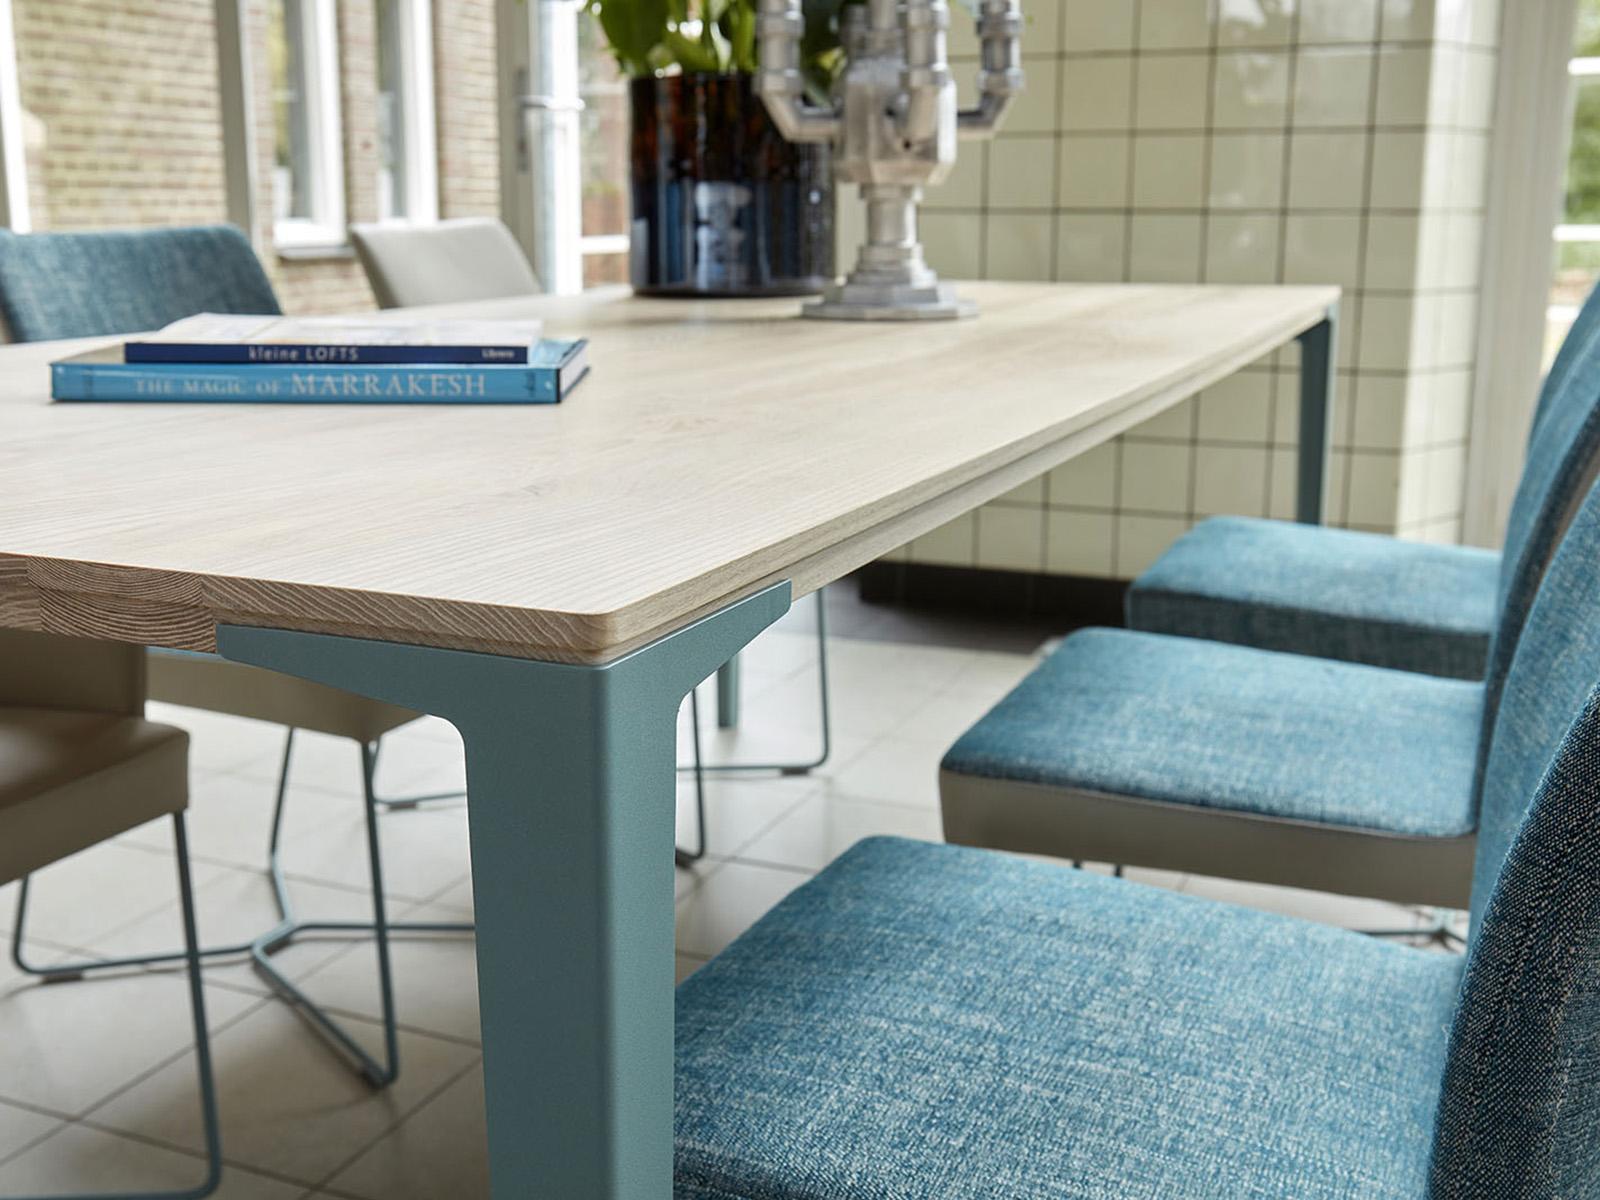 Bert Plantagie Jopp tafel